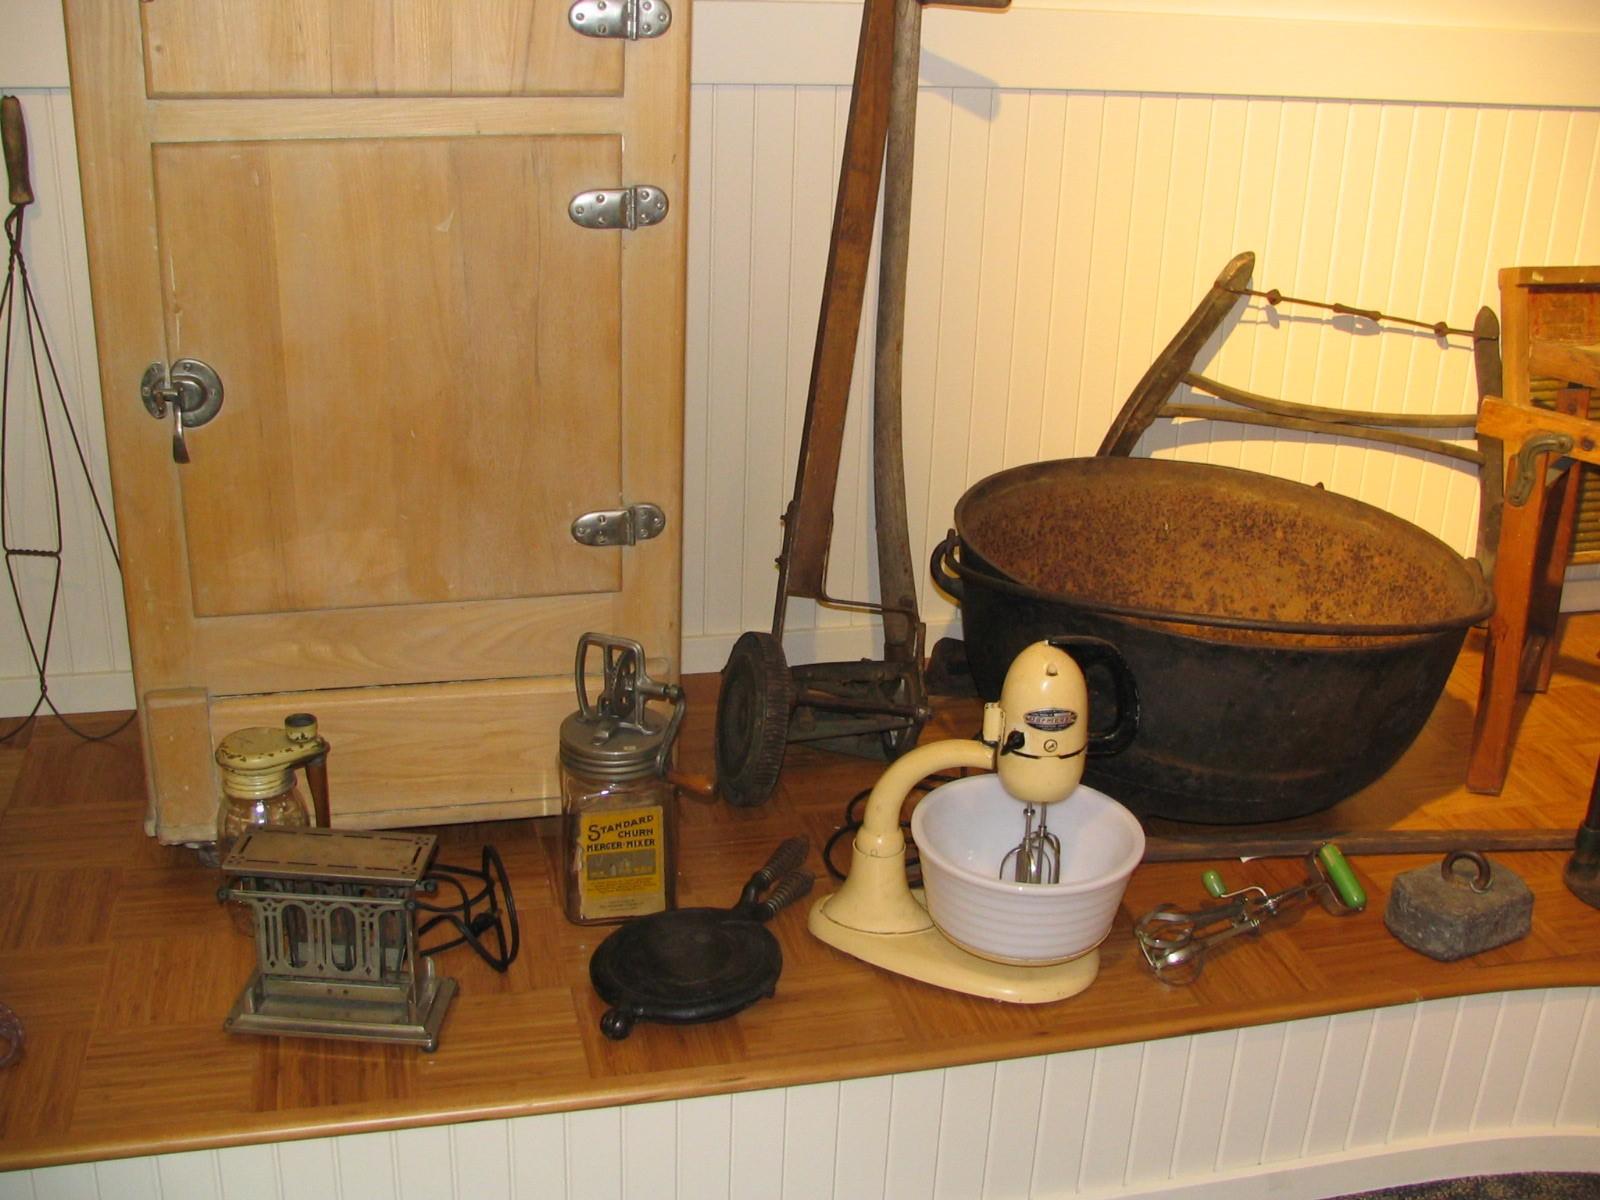 Heritage_Room_Ice_Box__Mixer__Civil_War_Kettle.jpg